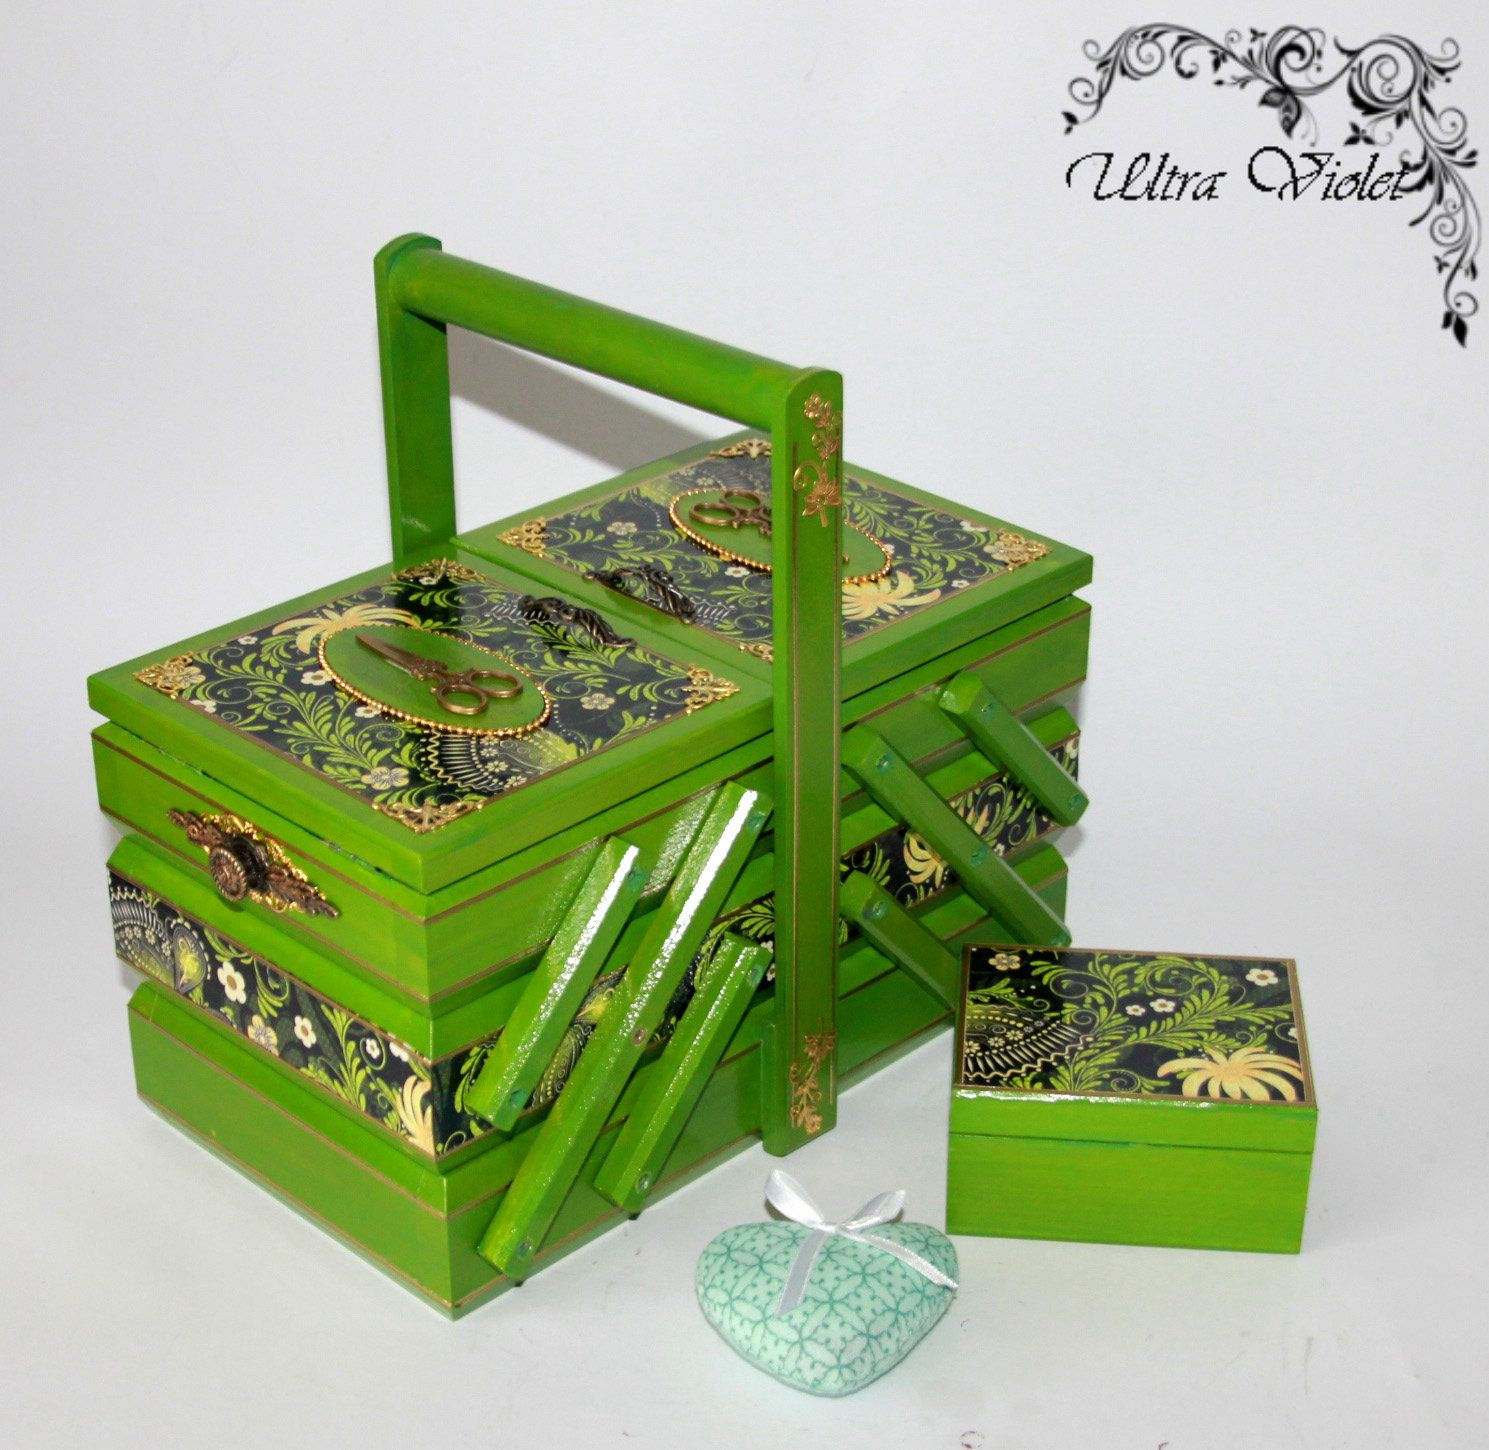 sewing knitting needles box with pin cushion sewing machine